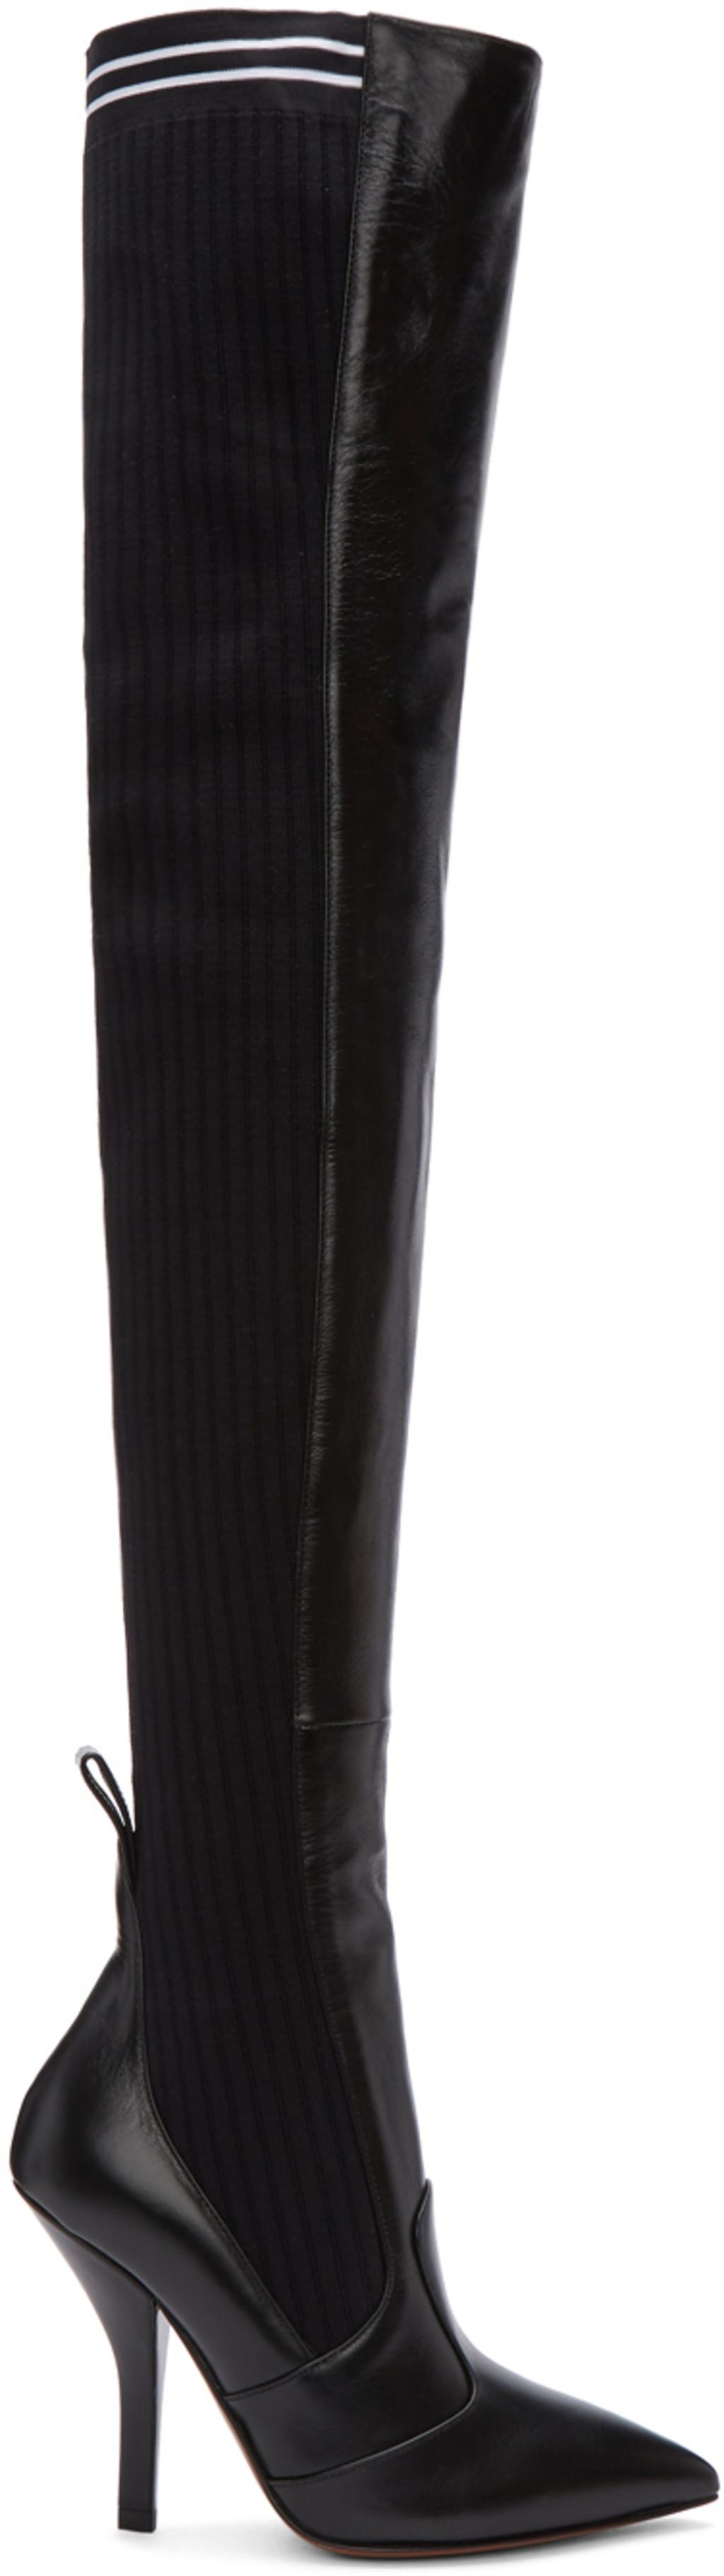 Prada Black Mexas Knee-High Boots